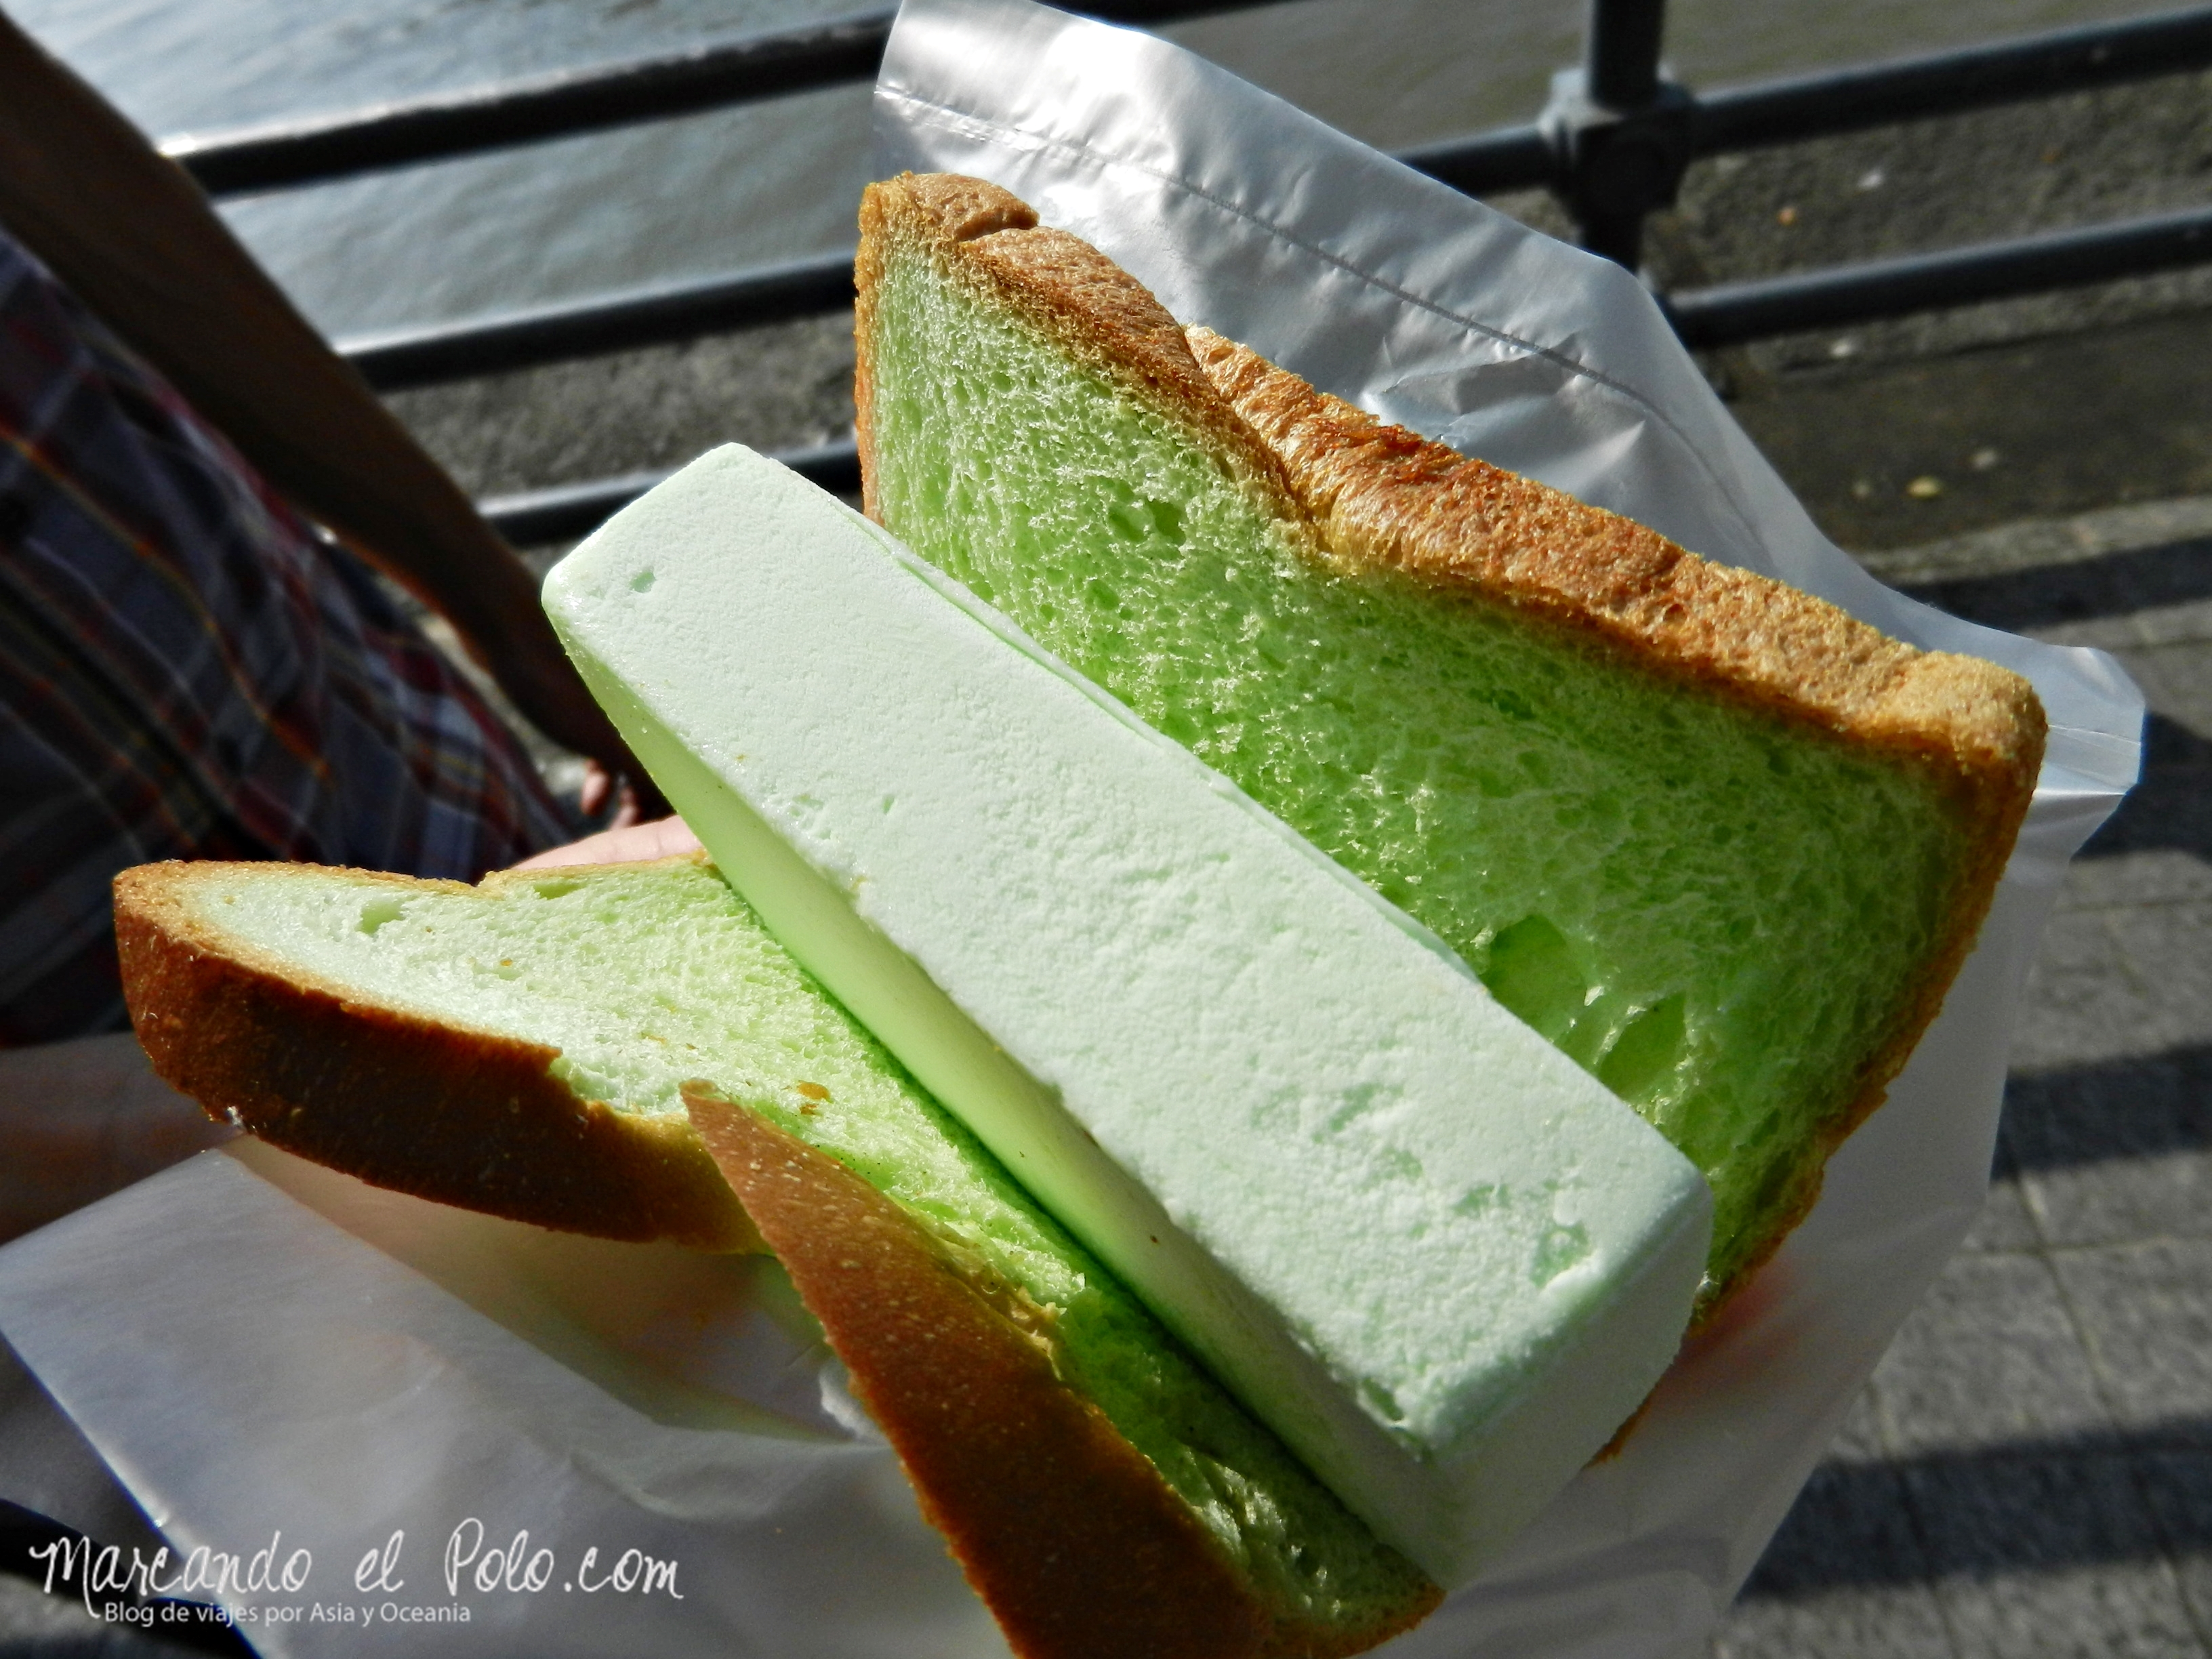 Icea Cream Sandwich, Singapur, Asia